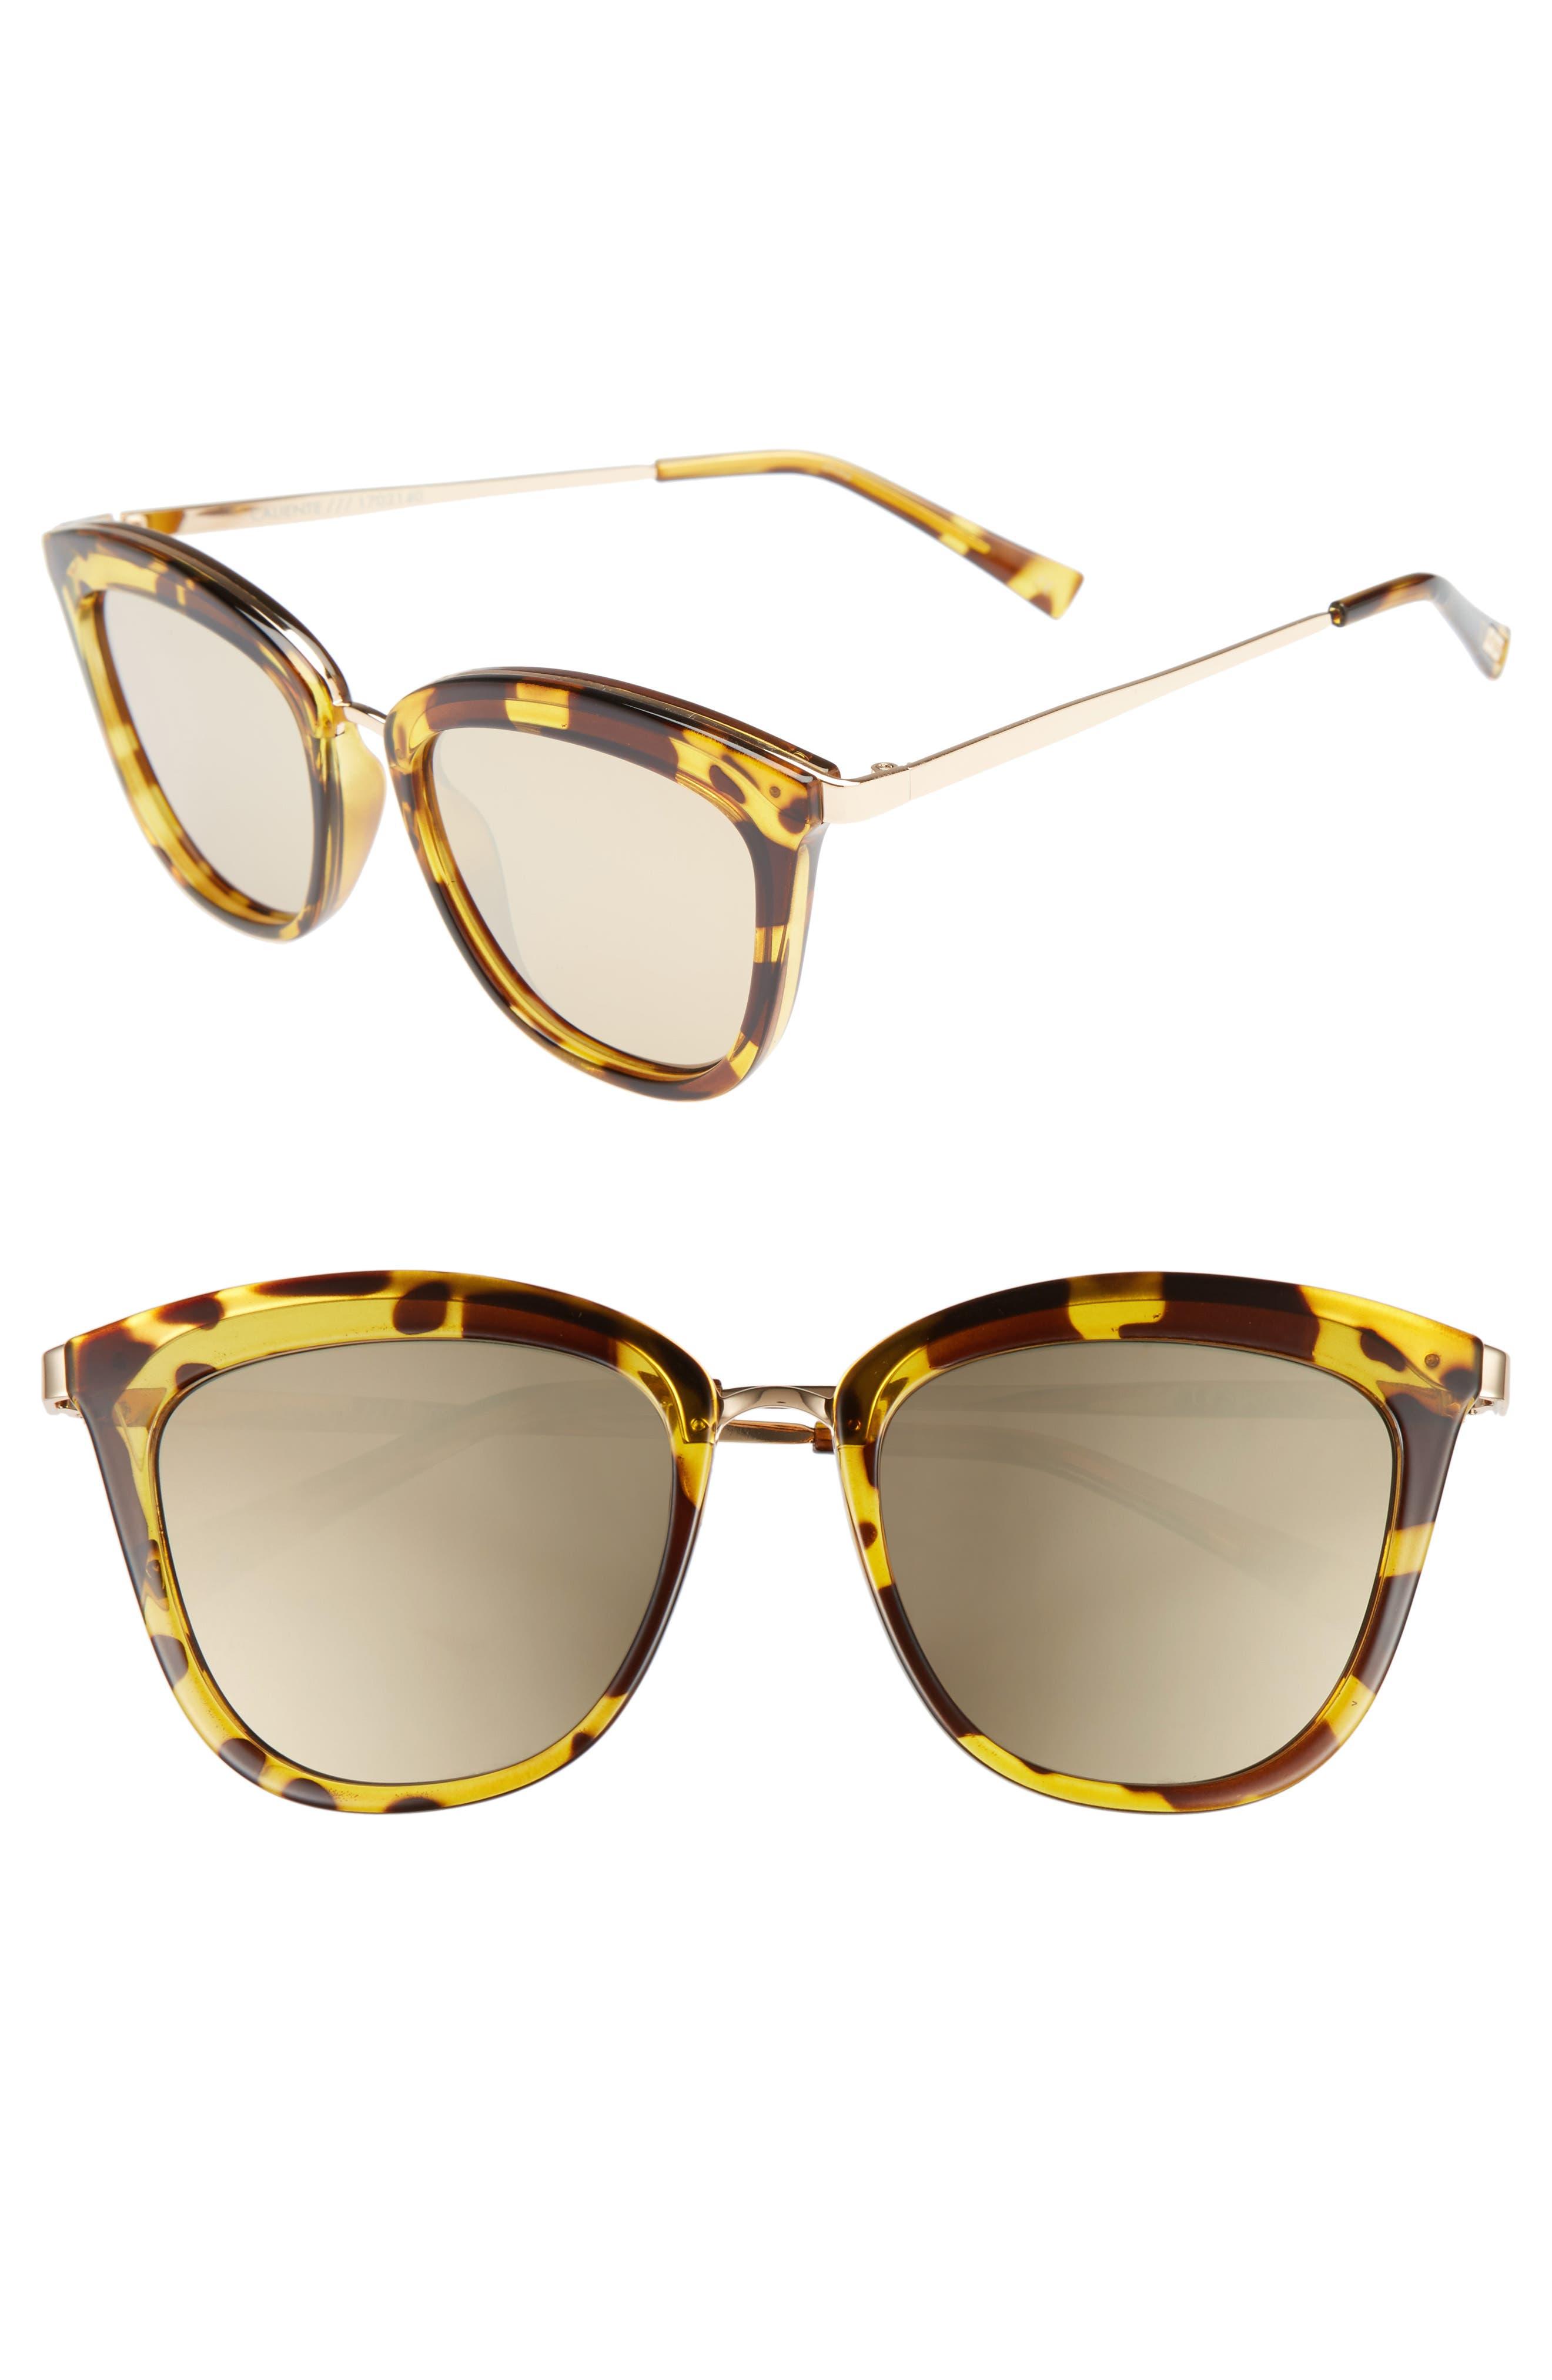 Alternate Image 1 Selected - Le Specs Caliente 53mm Cat Eye Sunglasses